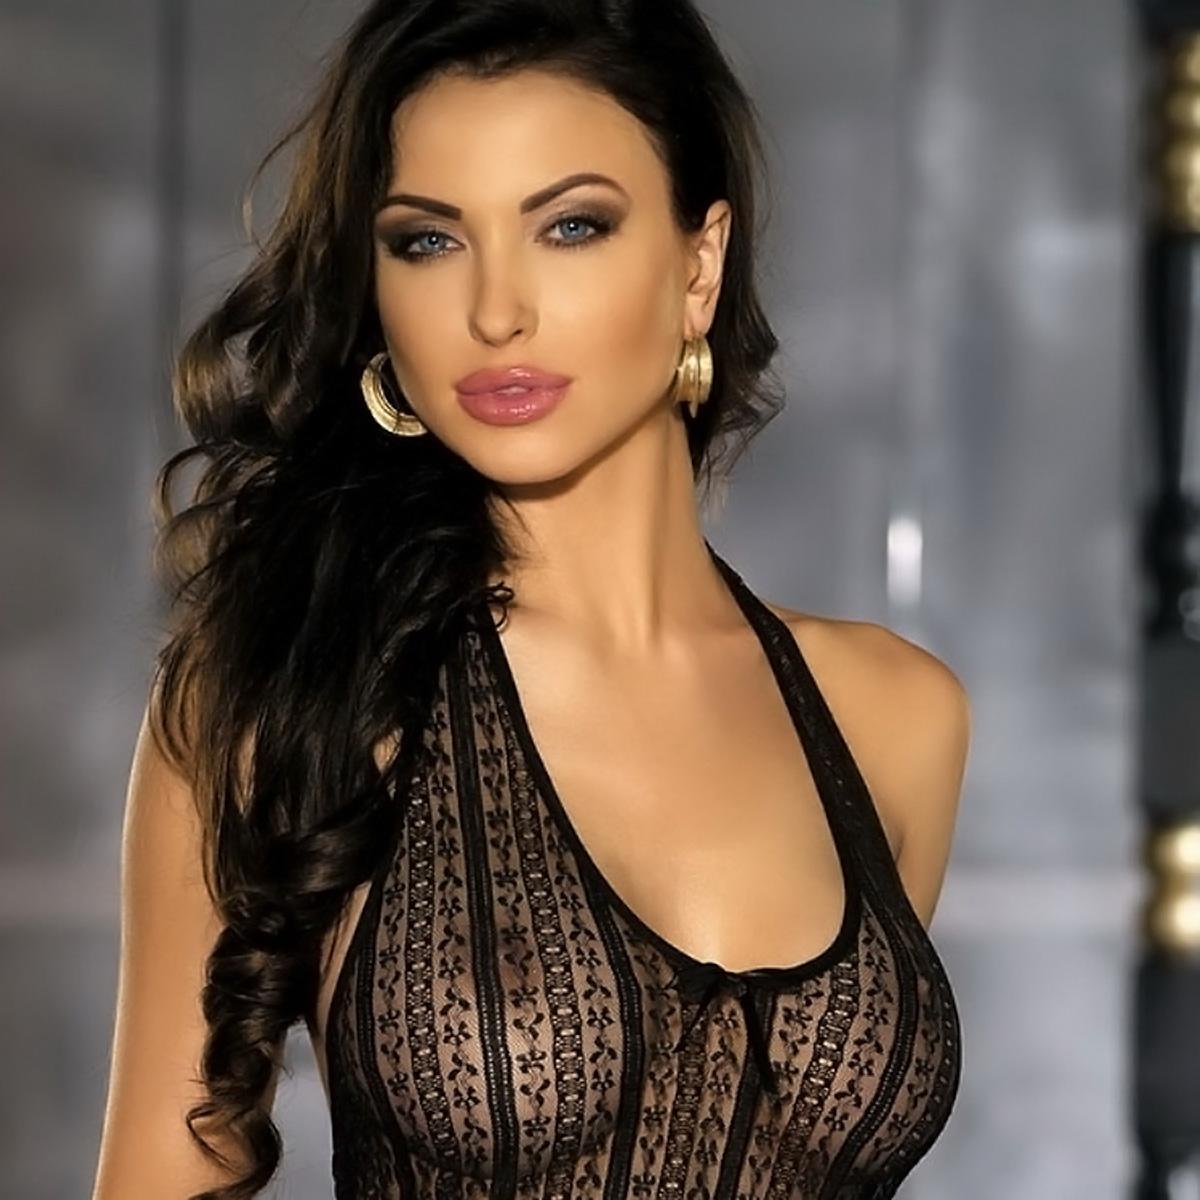 Monika Pietrasinska in Beauty's Love see through lingerie photo shoot 37x HQ